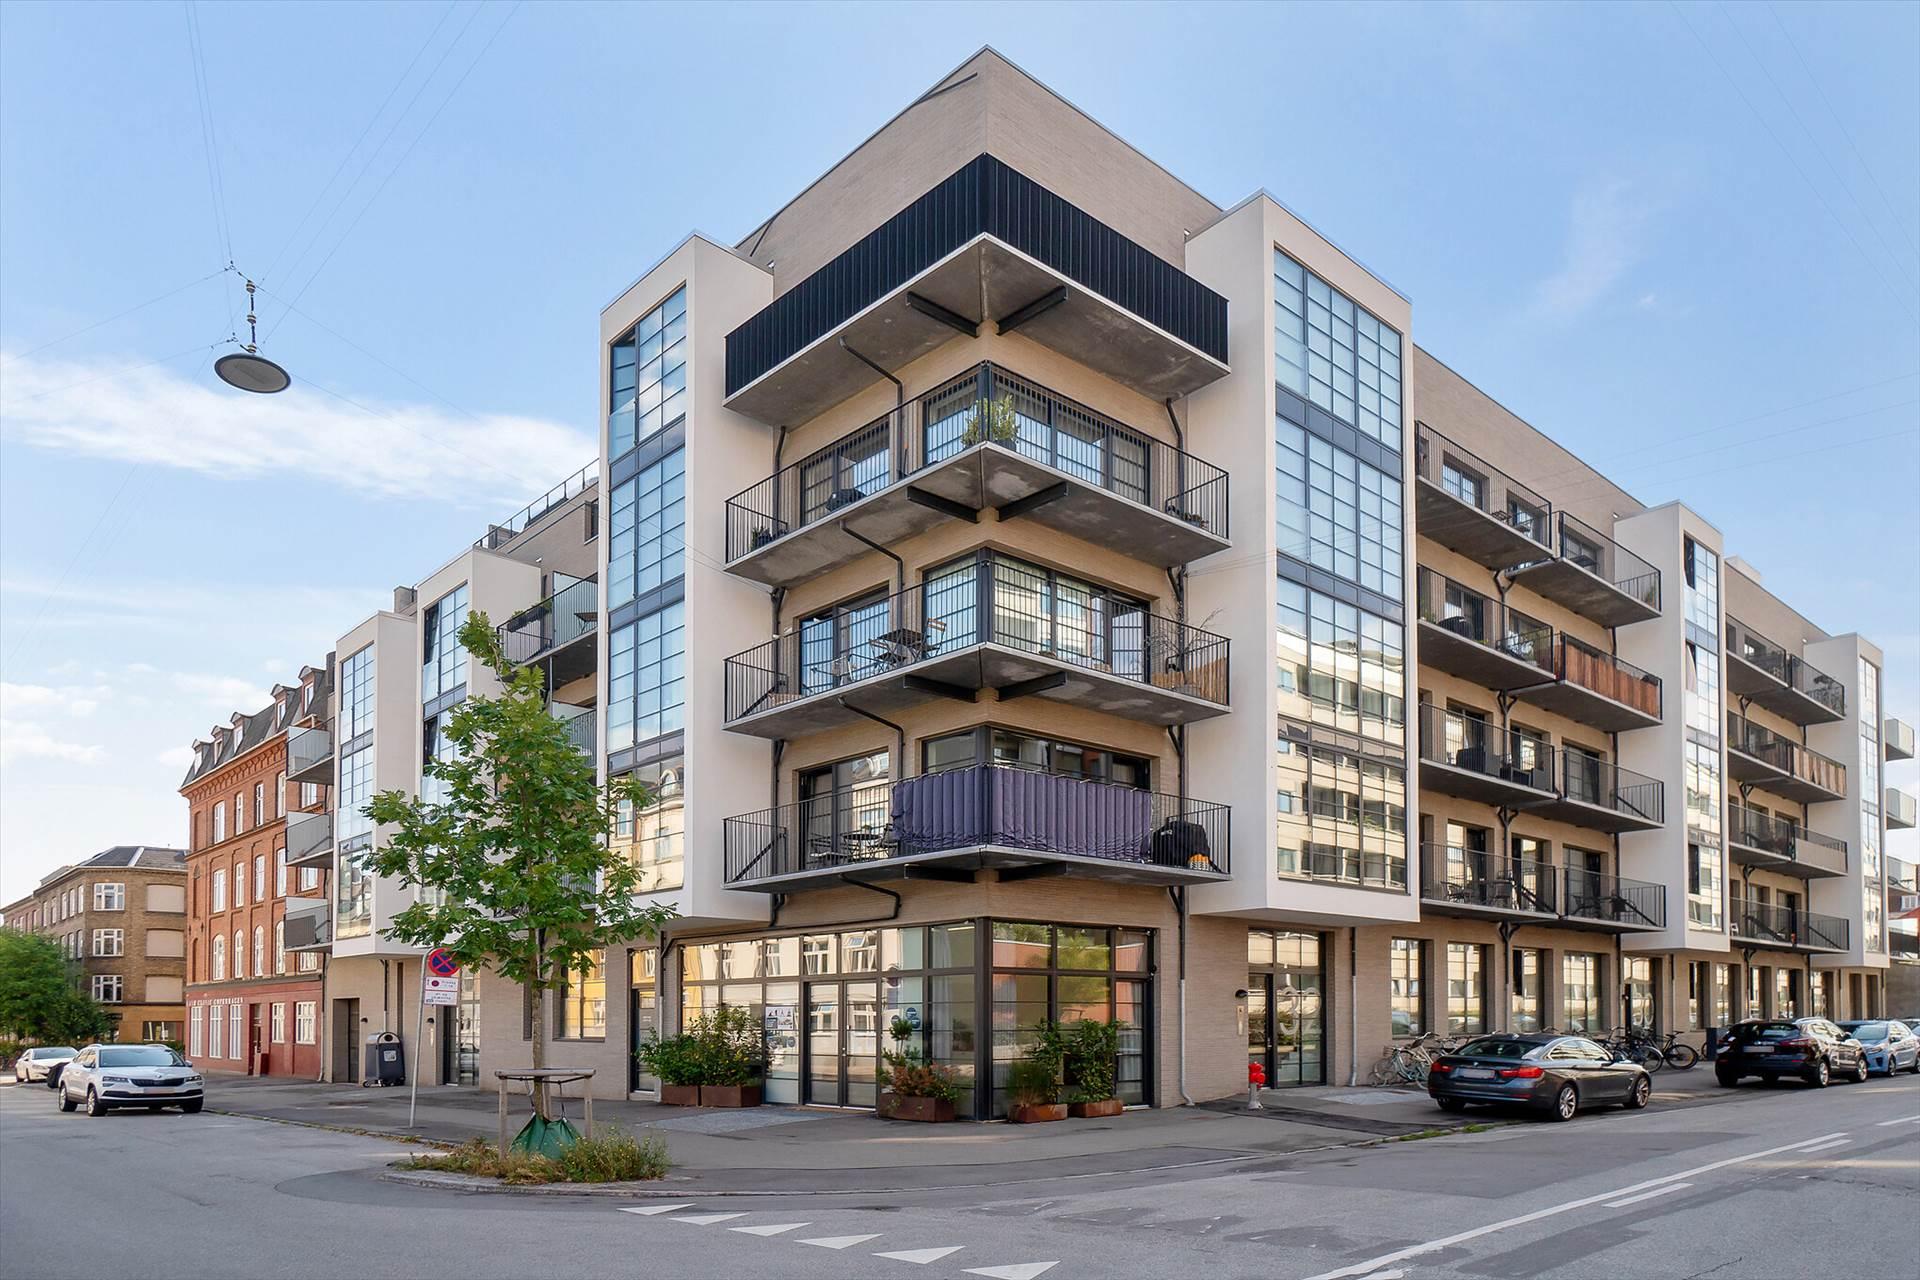 64 m² butik/showroom • Østerbro